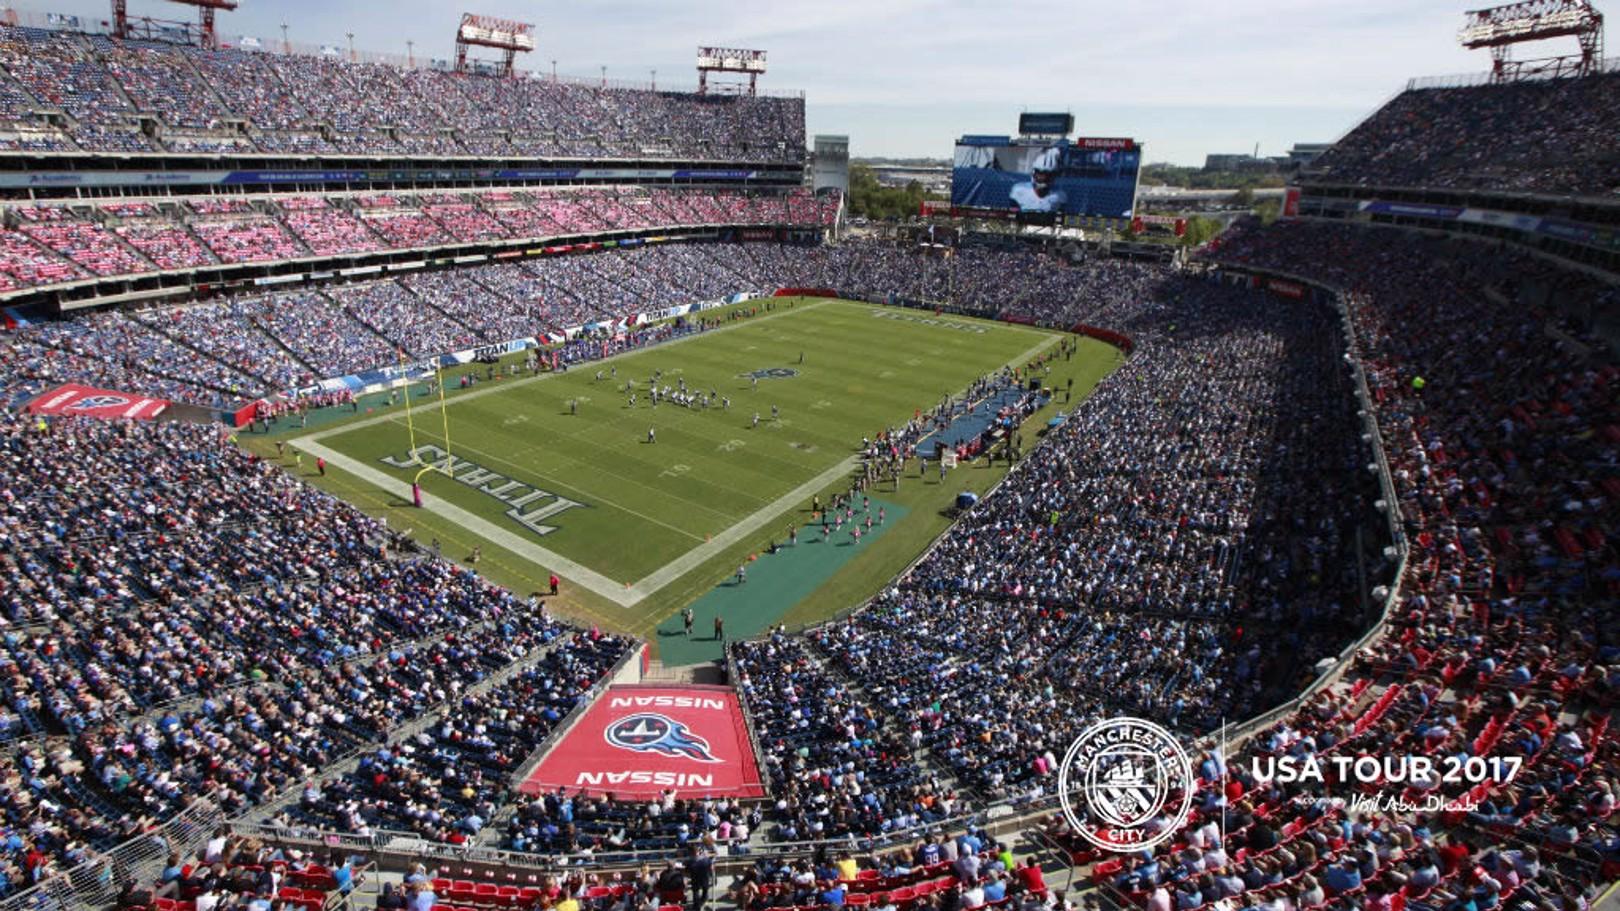 NISSAN STADIUM: City will take on Spurs in Nashville